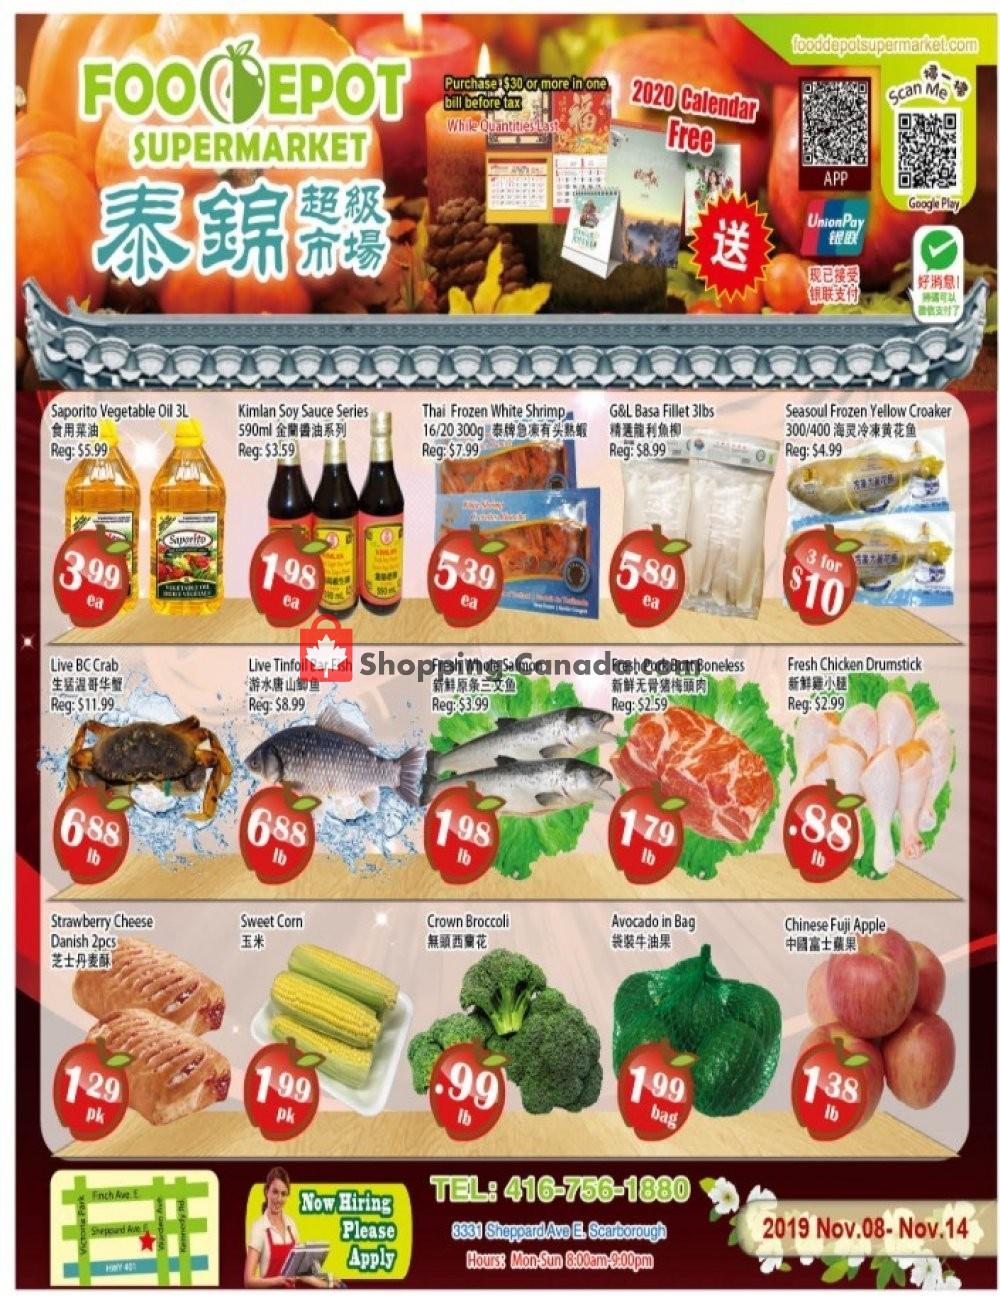 Flyer Food Depot Supermarket Canada - from Friday November 8, 2019 to Thursday November 14, 2019